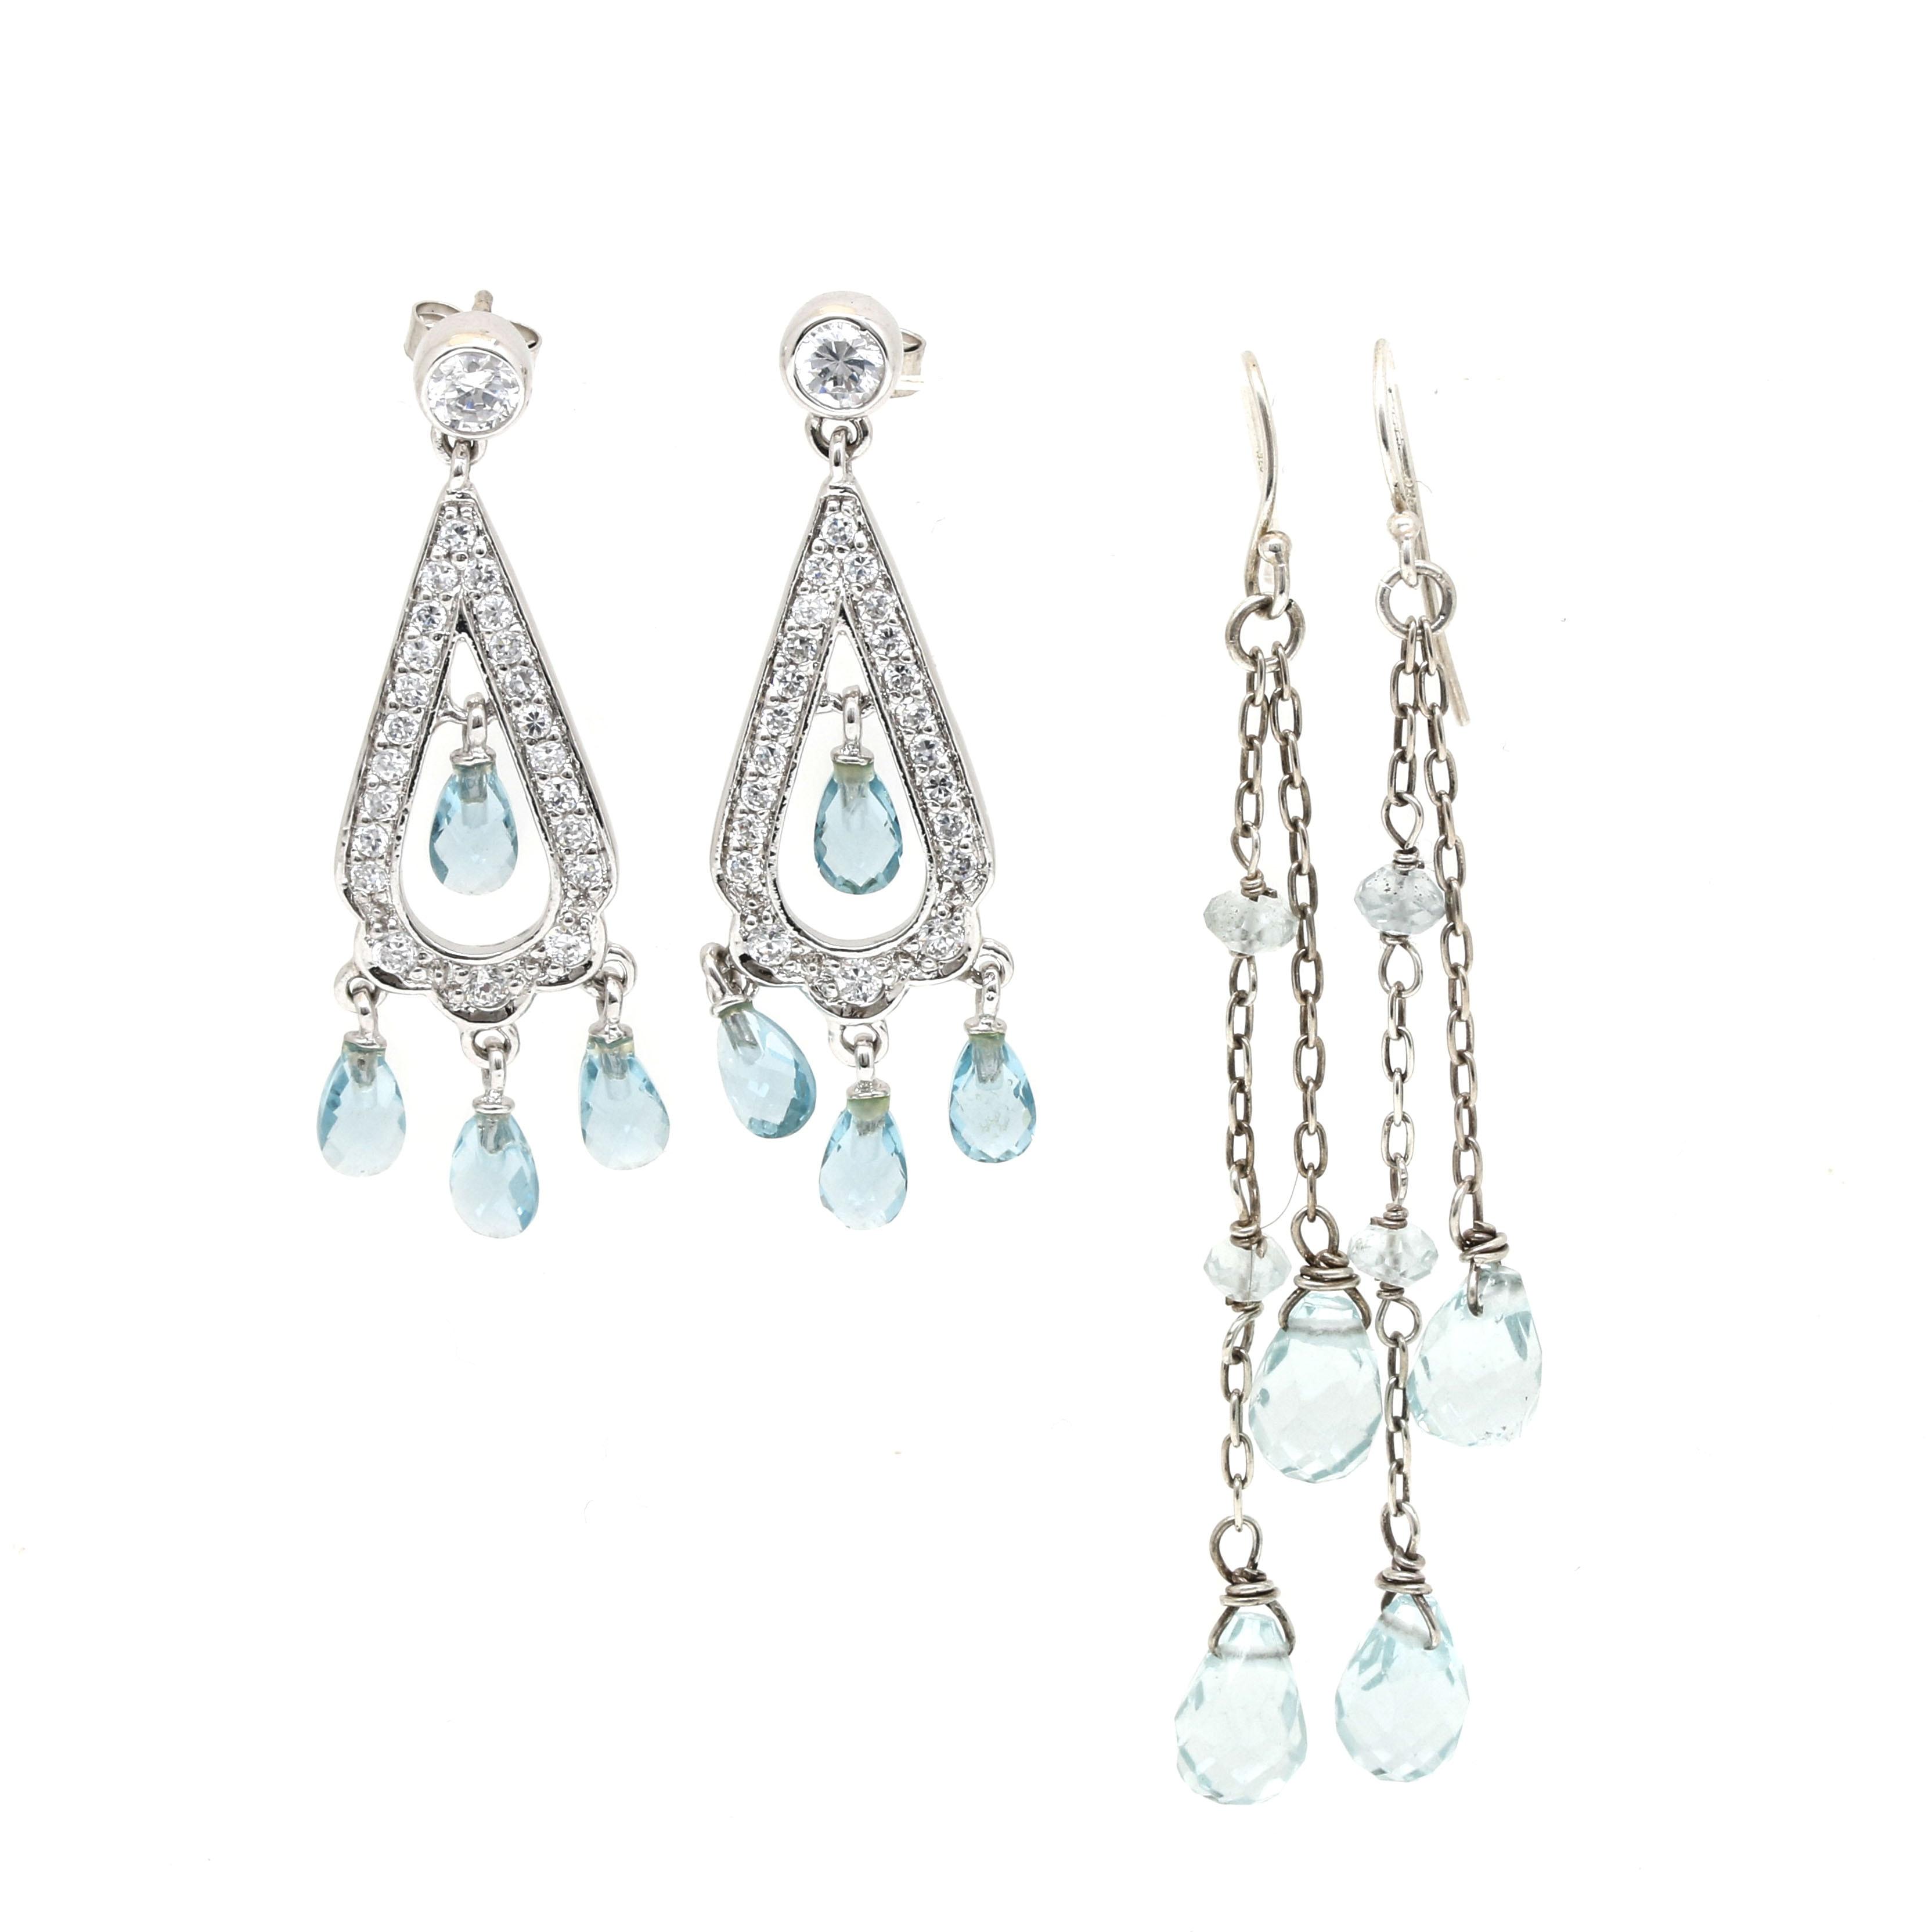 Sterling Silver Earring Assortment